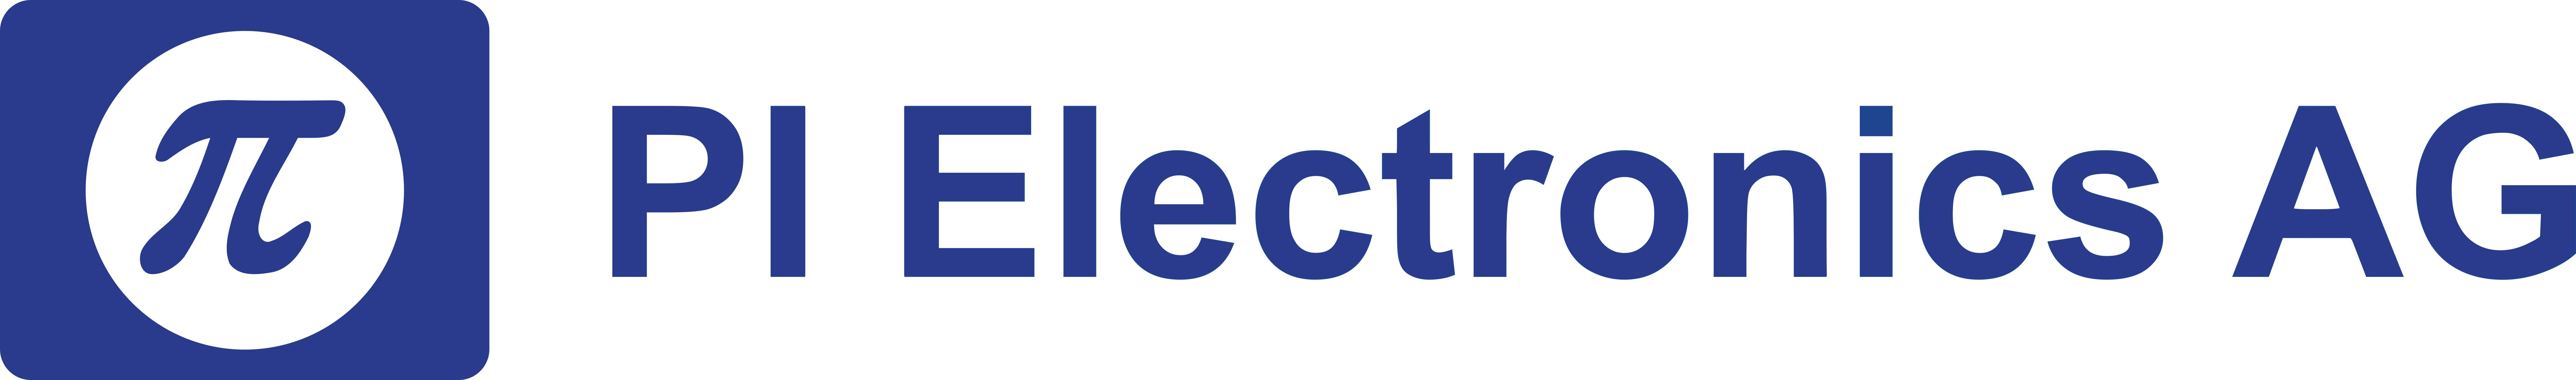 PI Electronics AG - Banner